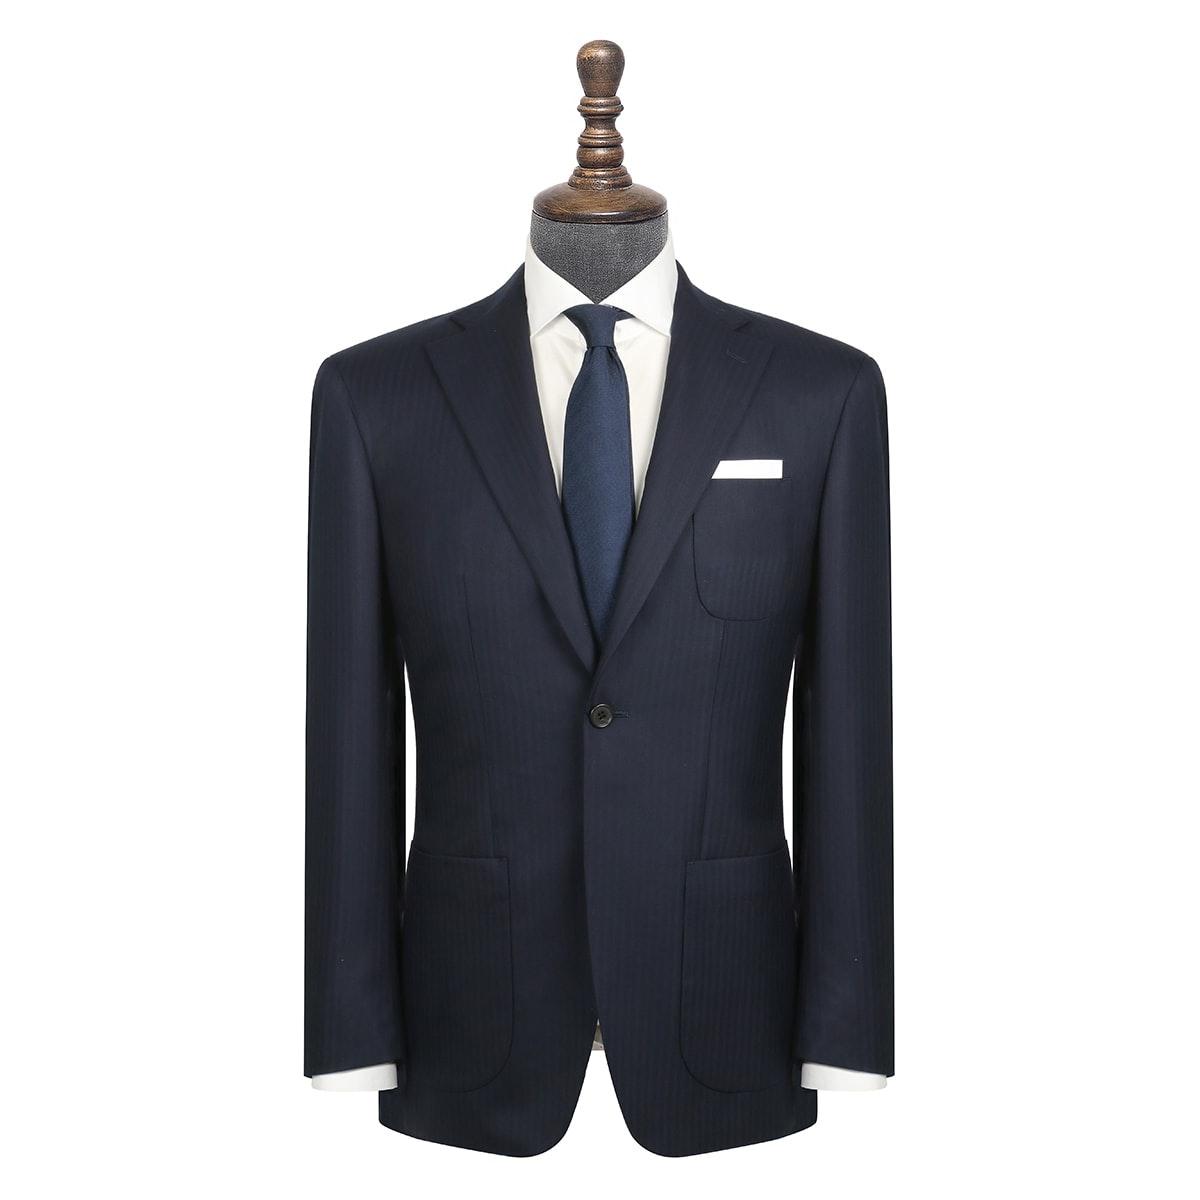 InStitchu Collection Kinfolk Navy Herringbone Wool Jacket